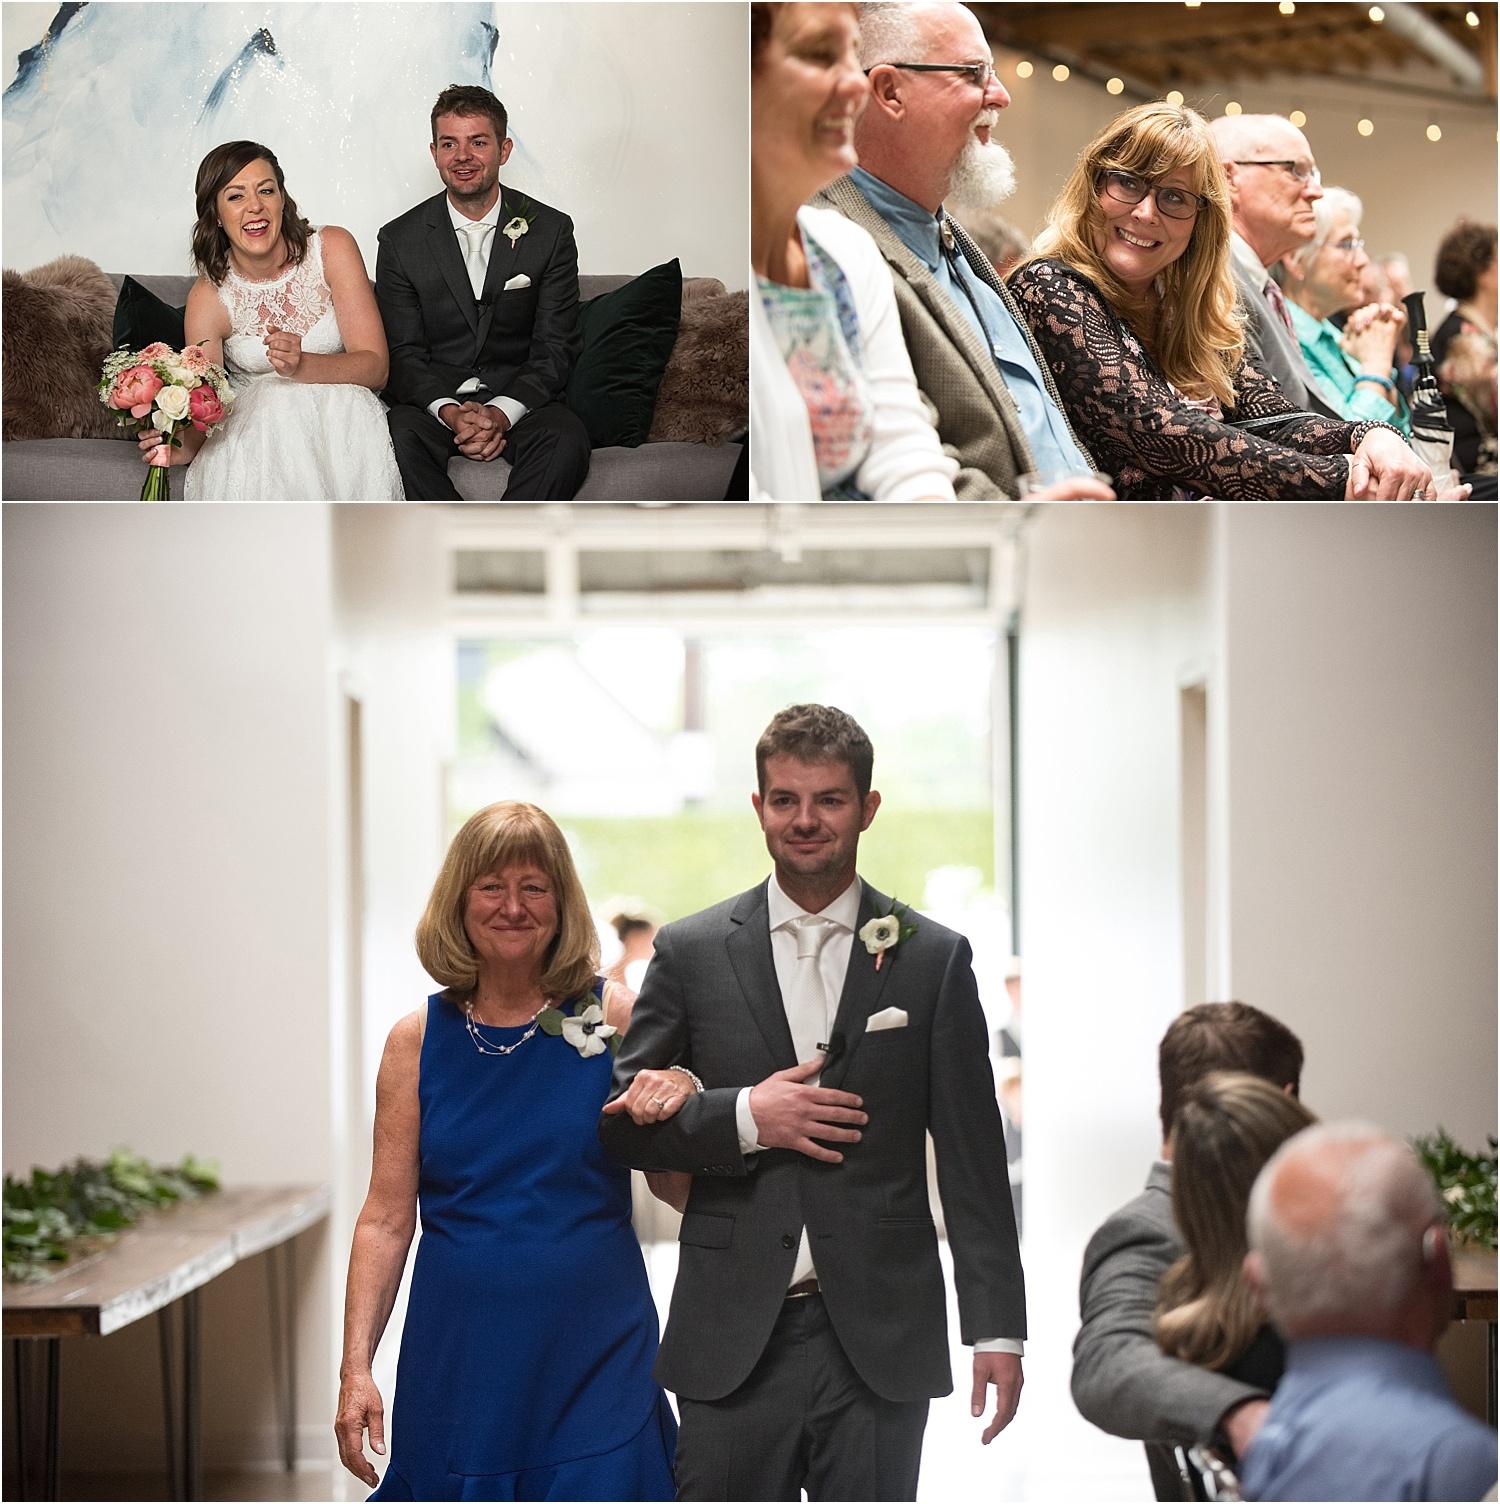 Denver_Wedding_Photography_Skylight_Urban_Venue_Modern_Bride_020.jpg